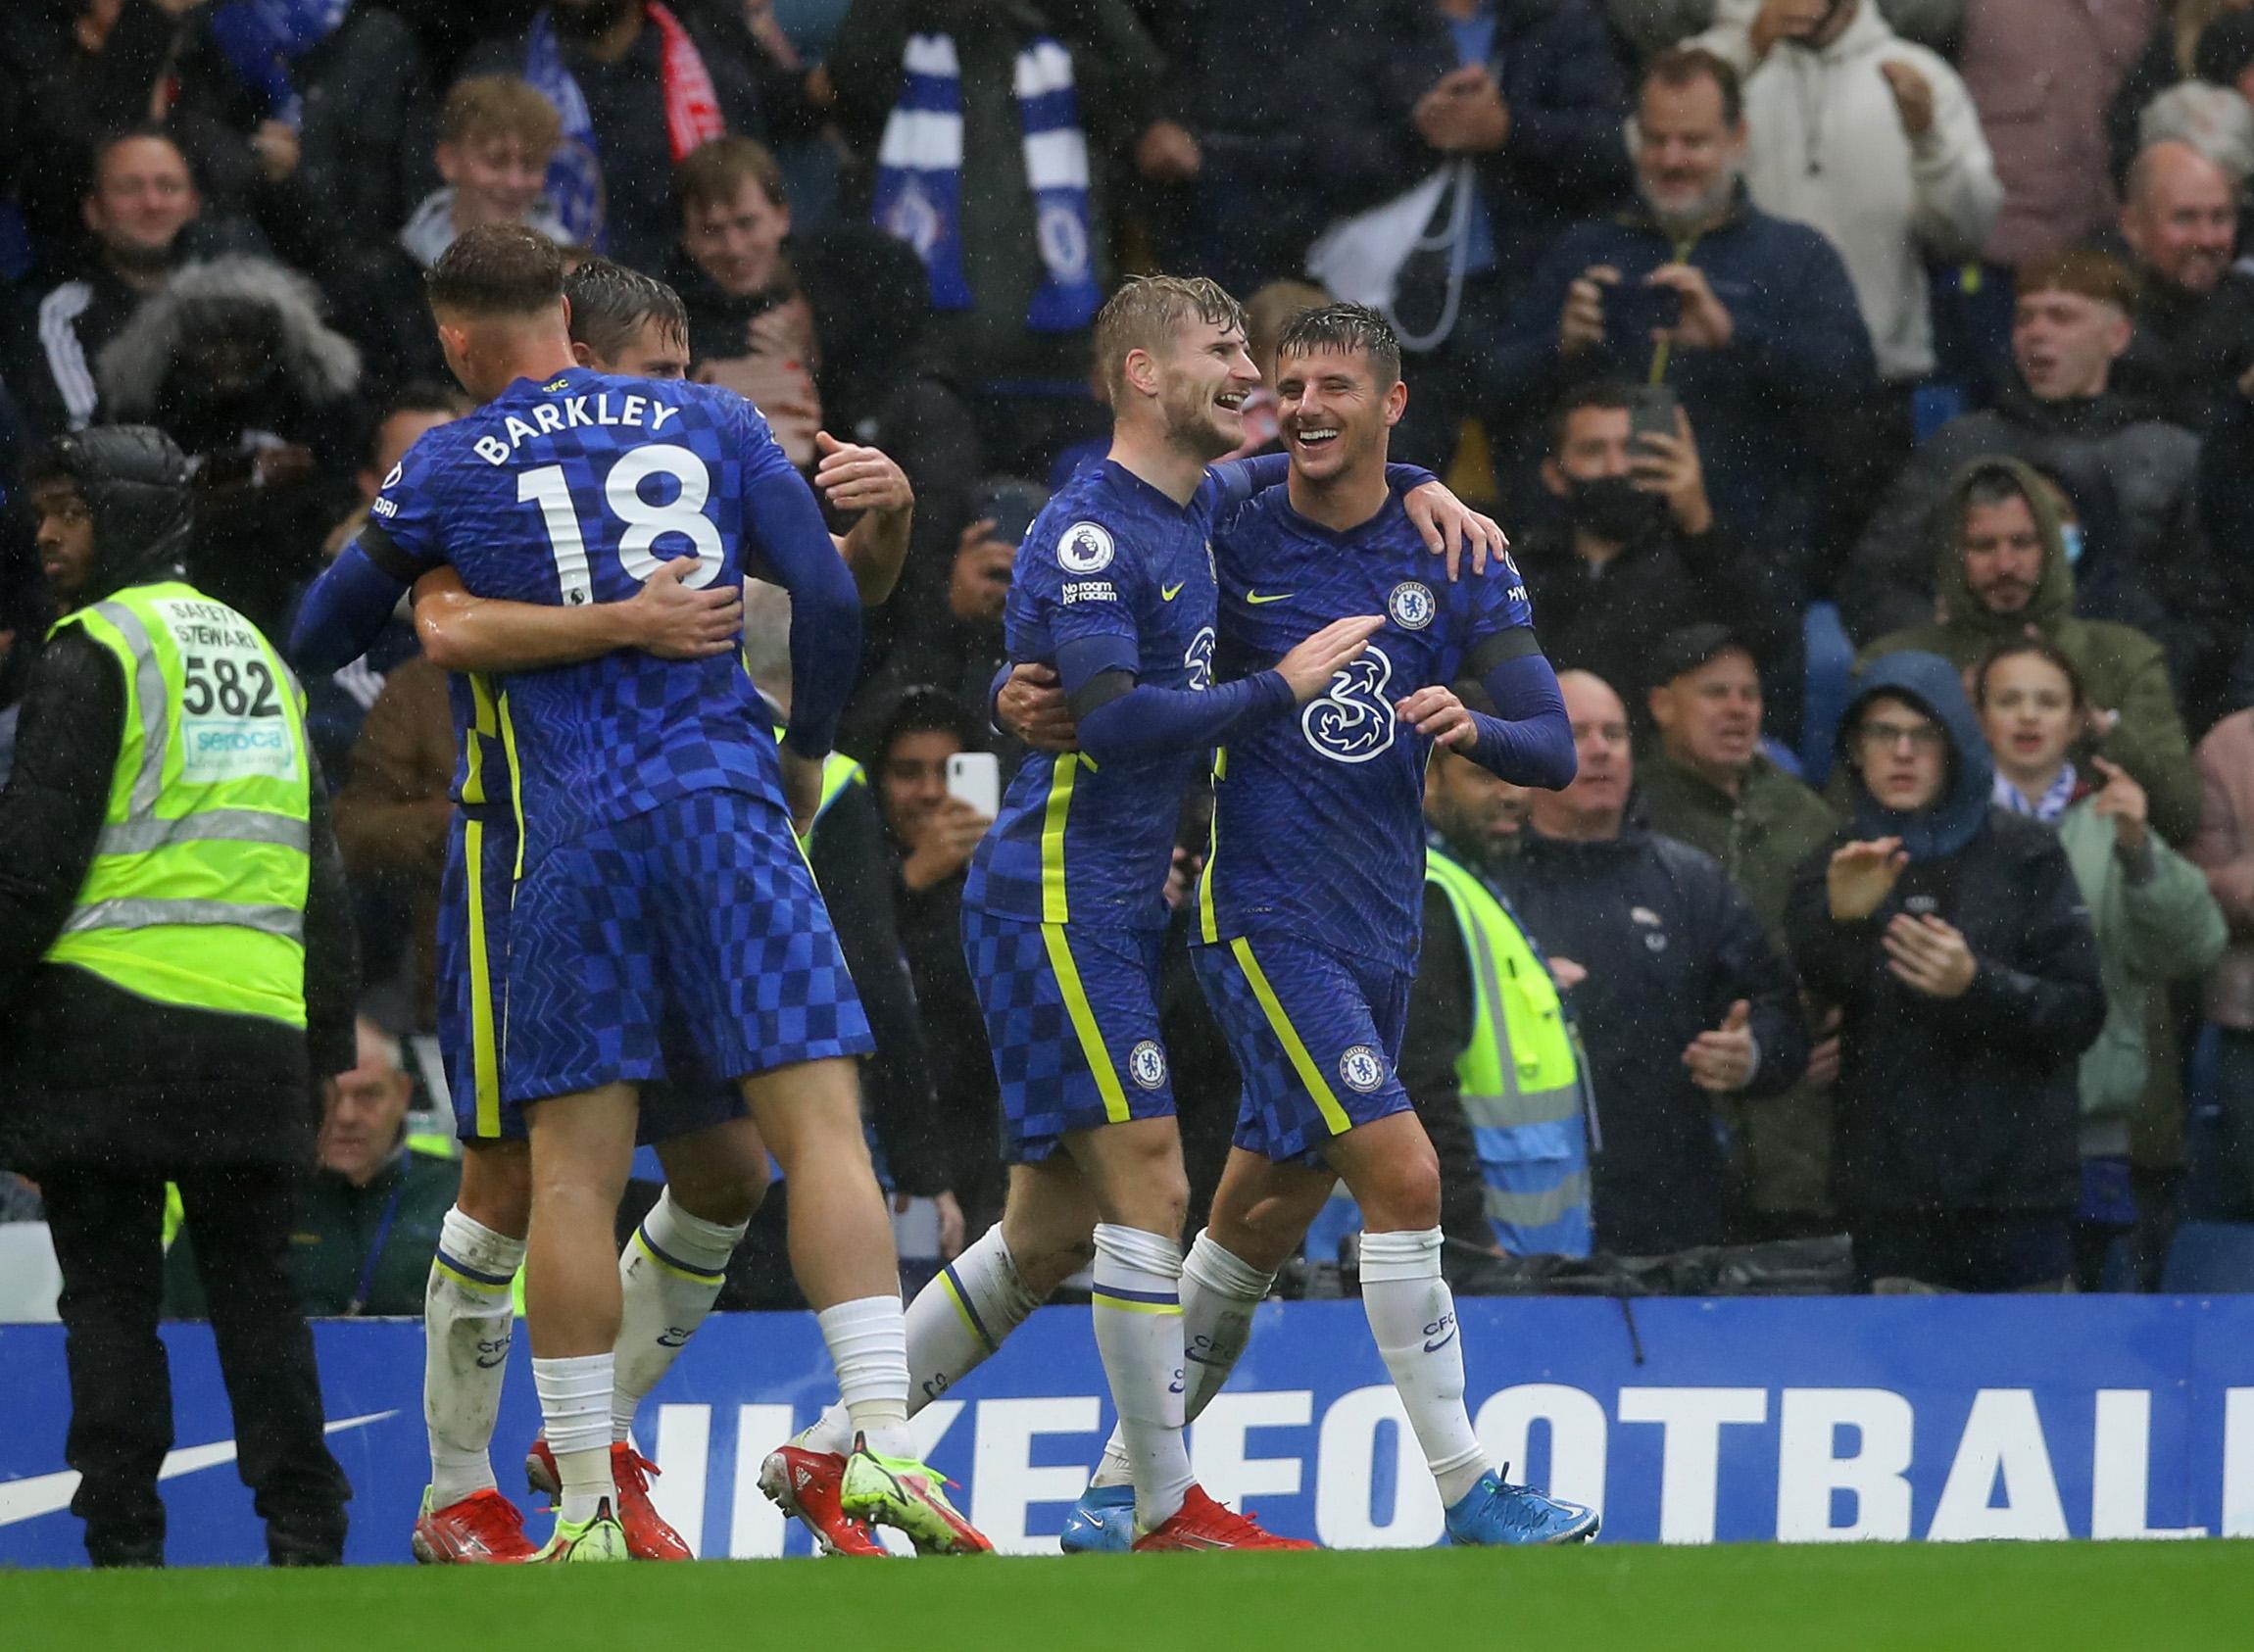 Premier League, Τσέλσι – Σαουθάμπτον 3-1: VARεσε στο τέλος τους «Άγιους»